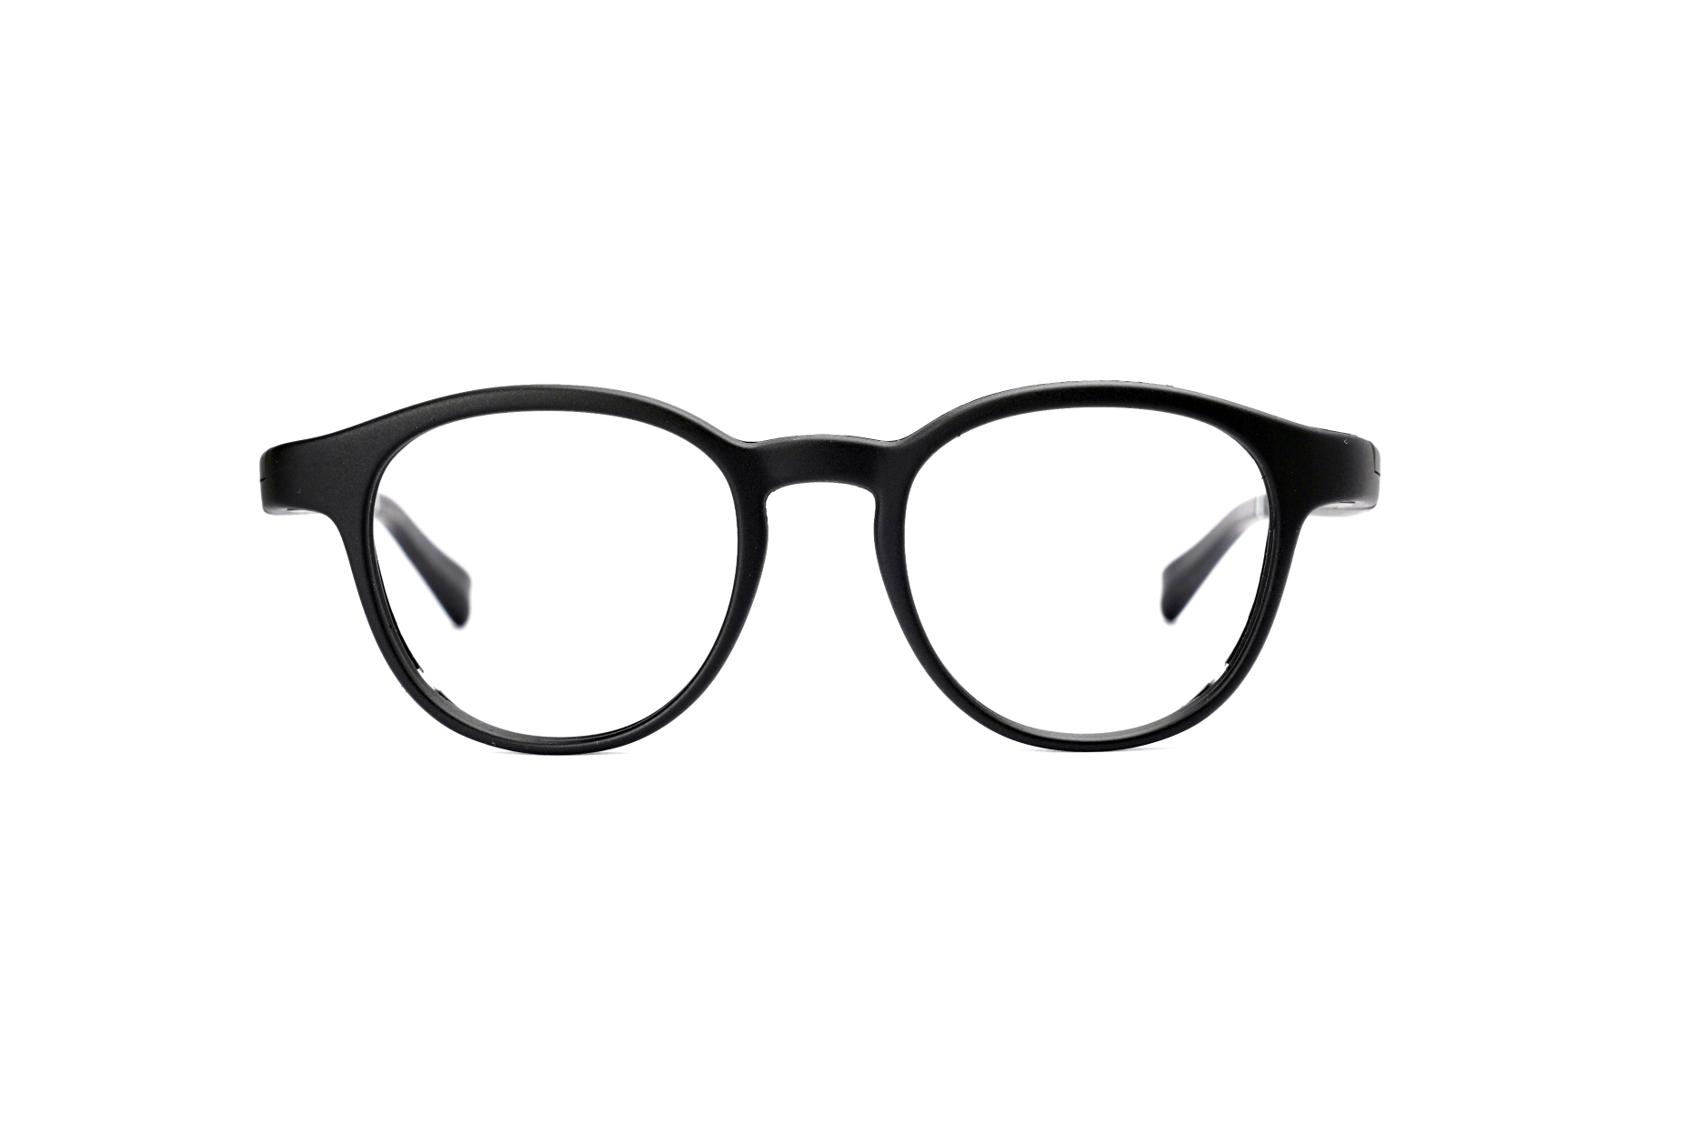 Serenity Eyewear Ronde Noir face